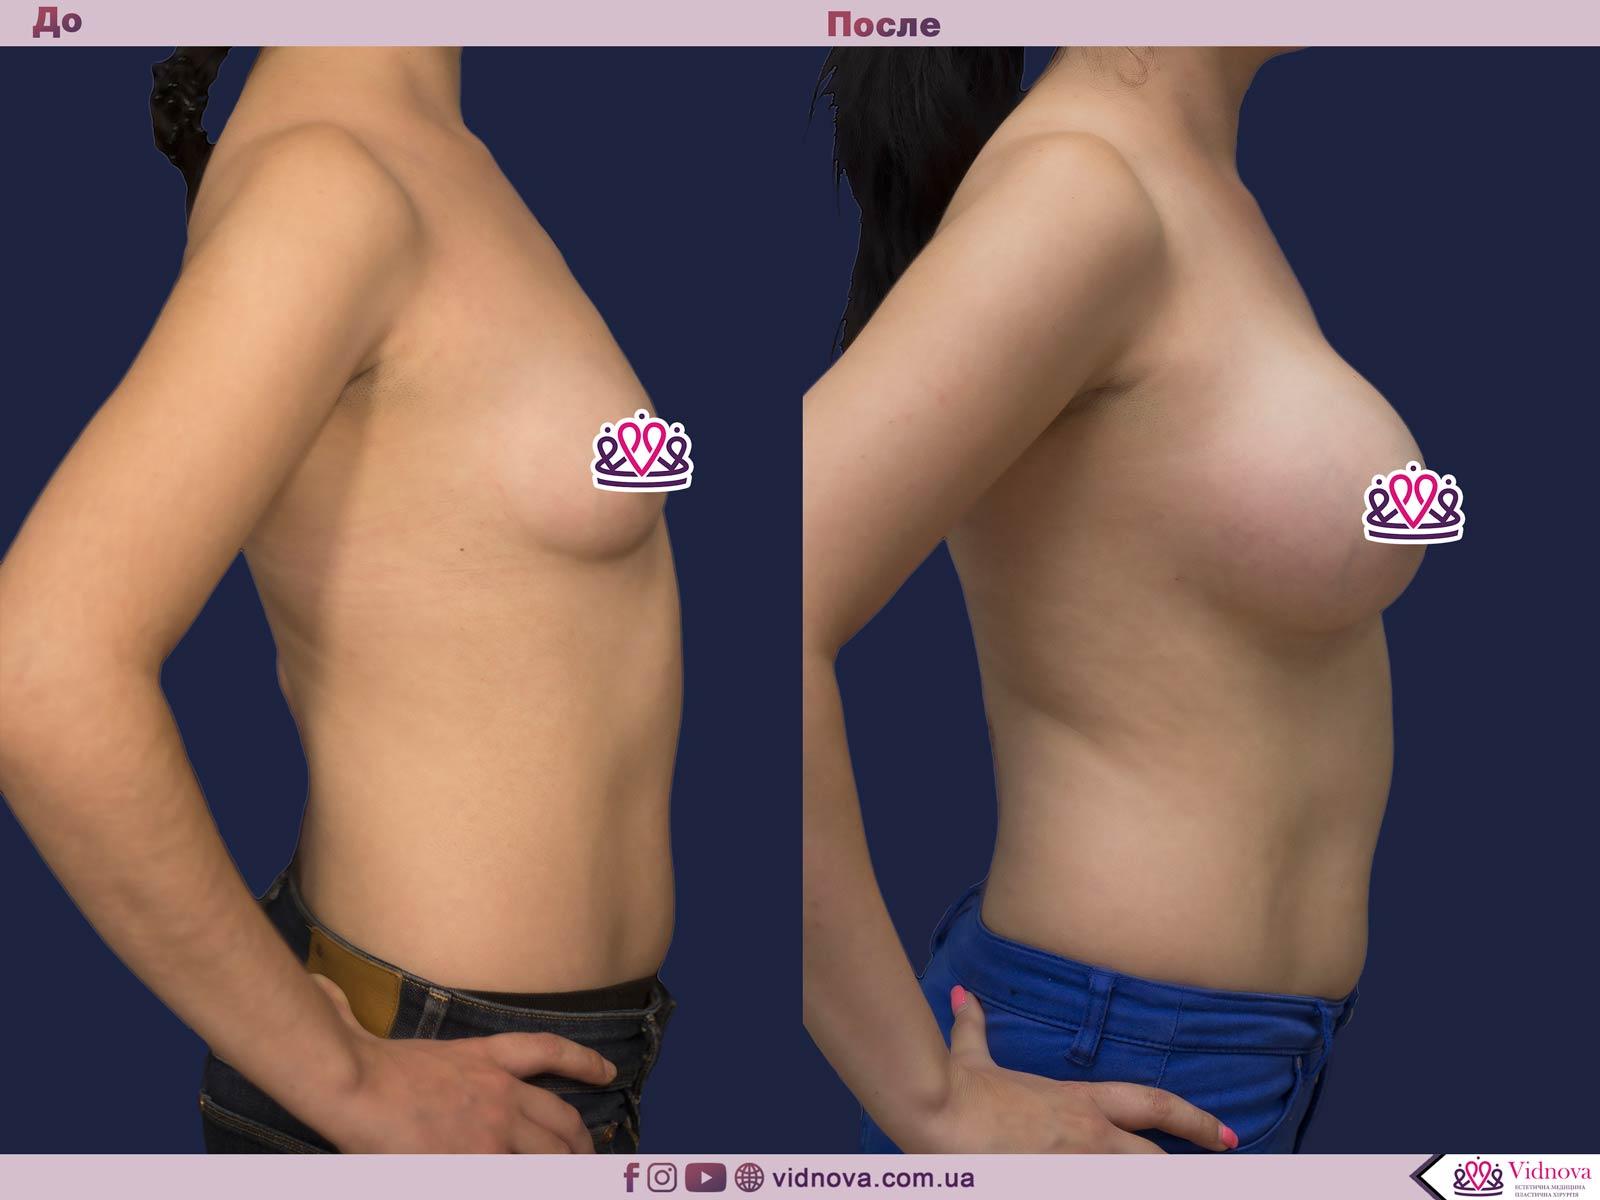 Увеличение груди: Фото ДО и ПОСЛЕ - Пример №72-3 - Клиника Vidnova